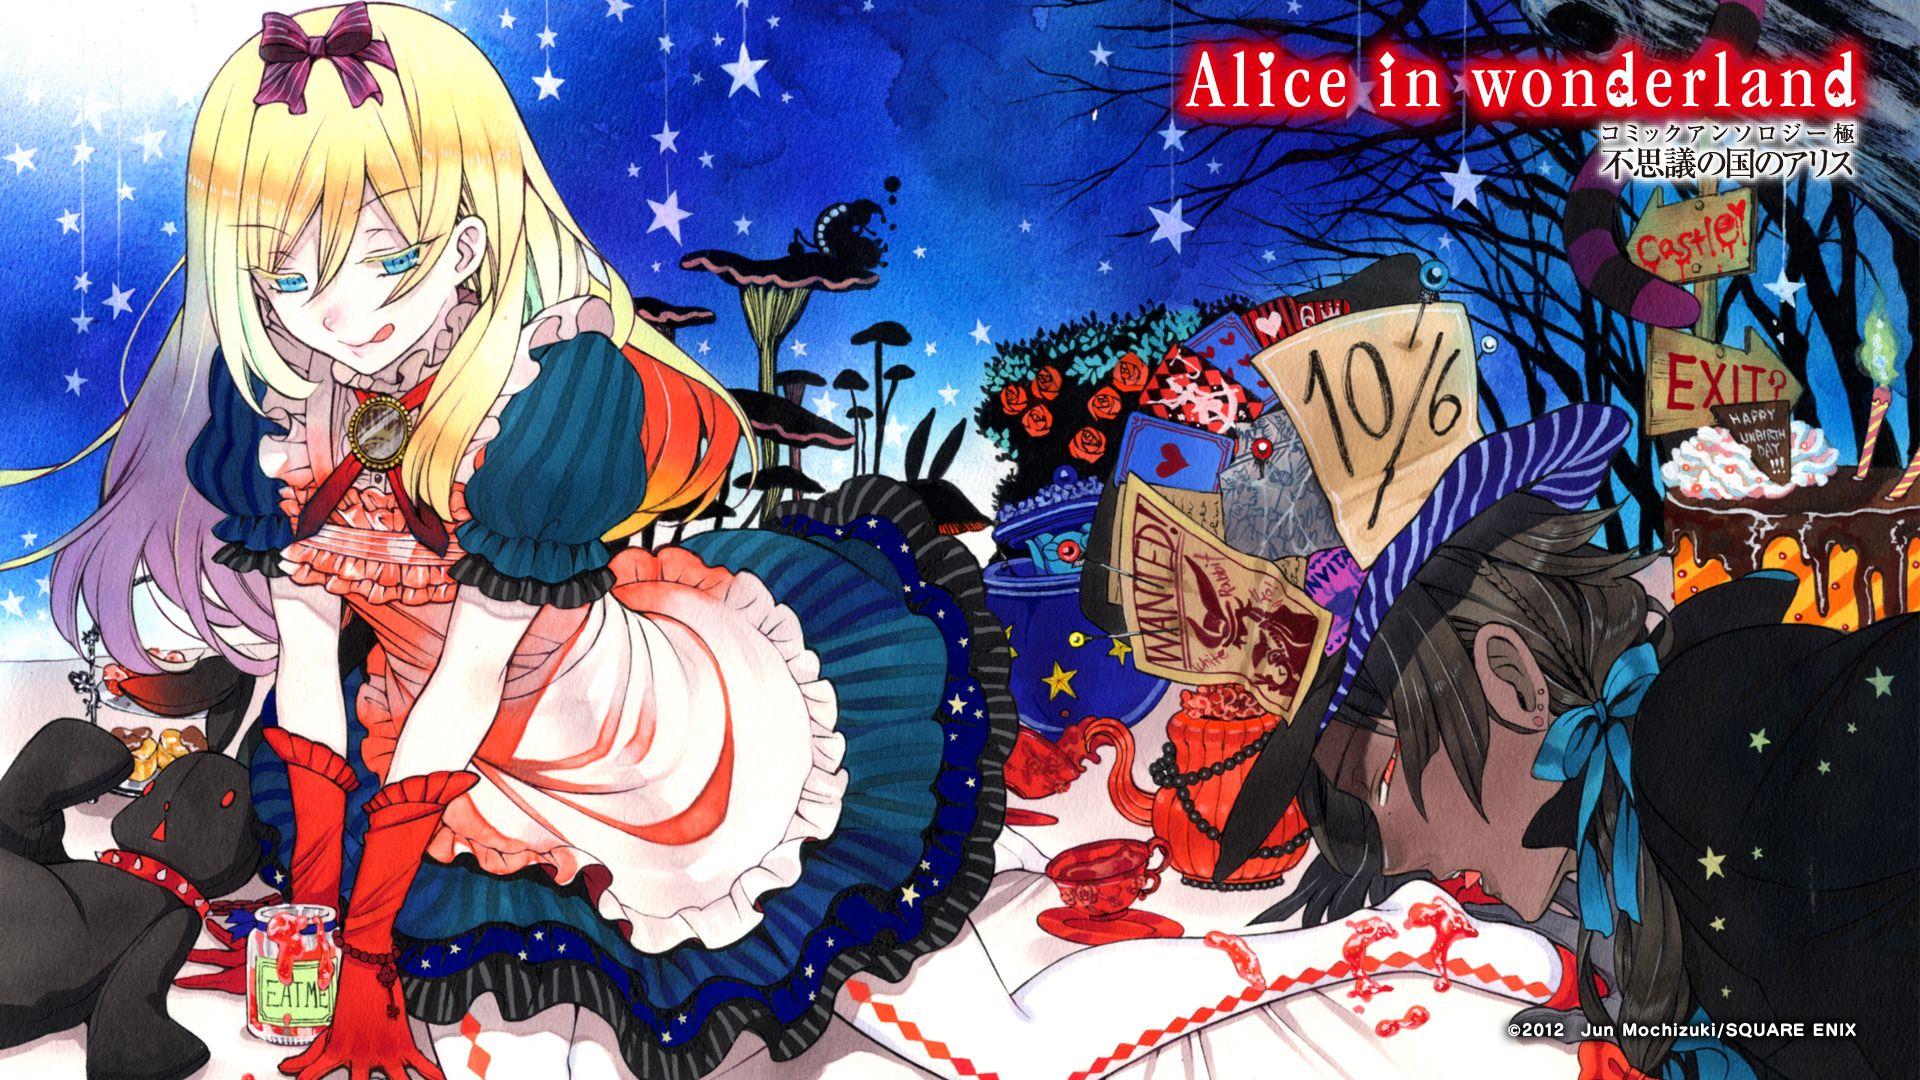 jun mochizuki aliceinwonderland anime alice in. Black Bedroom Furniture Sets. Home Design Ideas